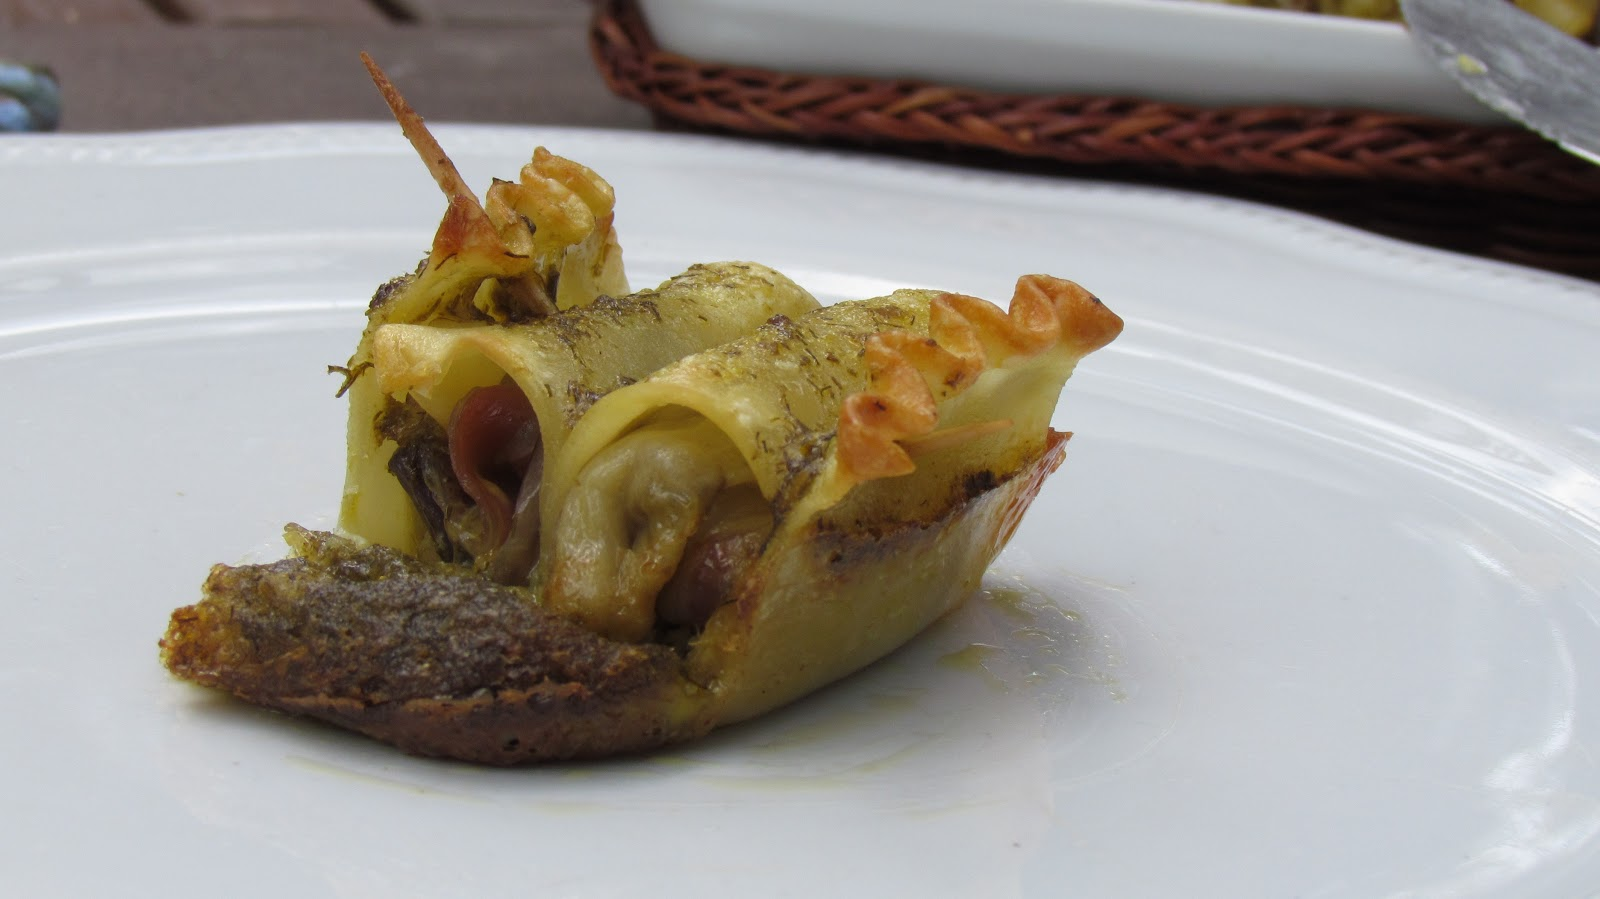 la lasagna arrotolata